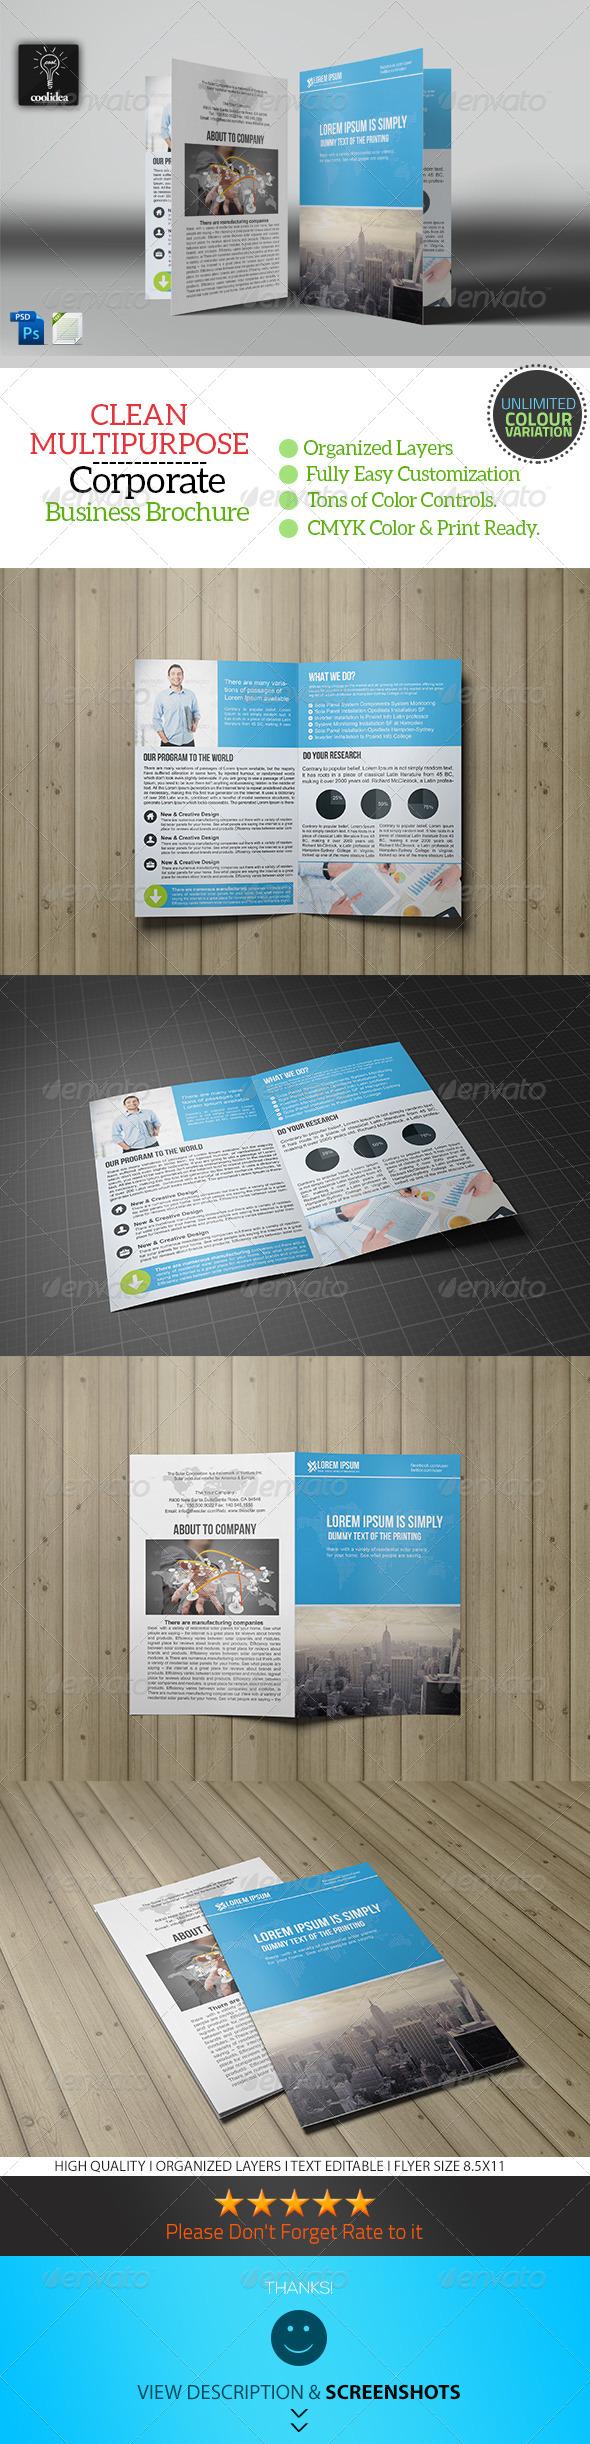 Bifold Business Brochure Template Vol03